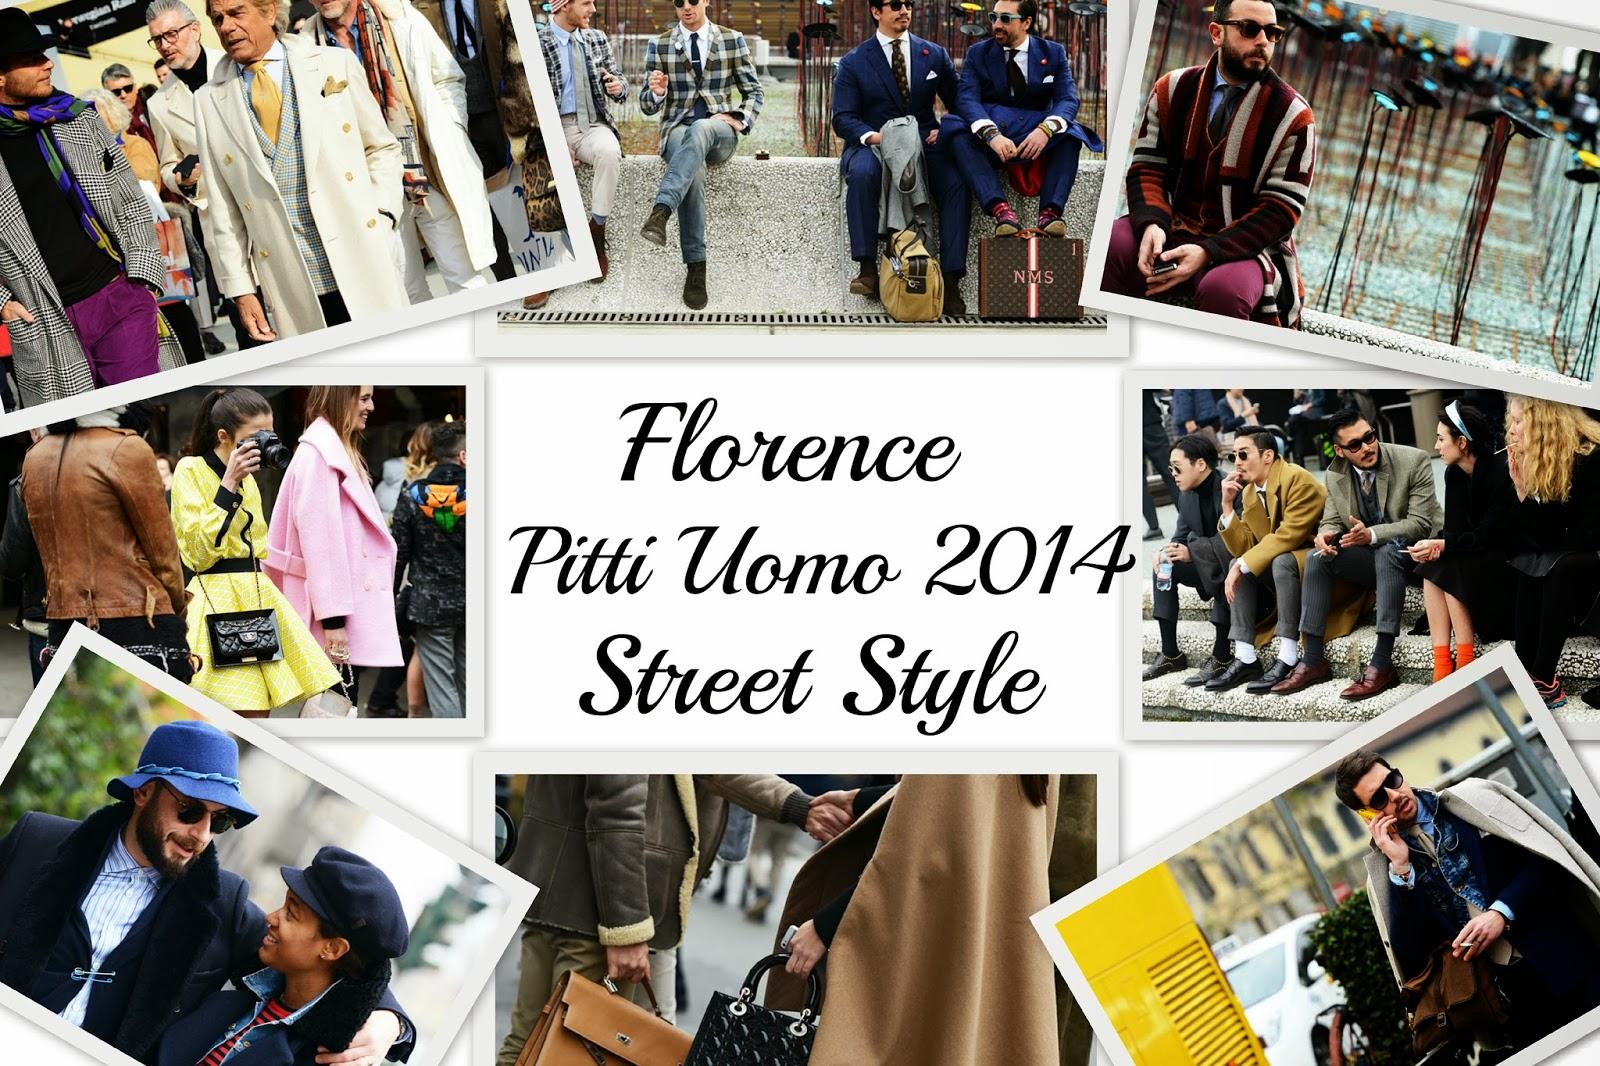 http://www.syriouslyinfashion.com/2014/01/pitti-uomo-2014-street-style-show.html